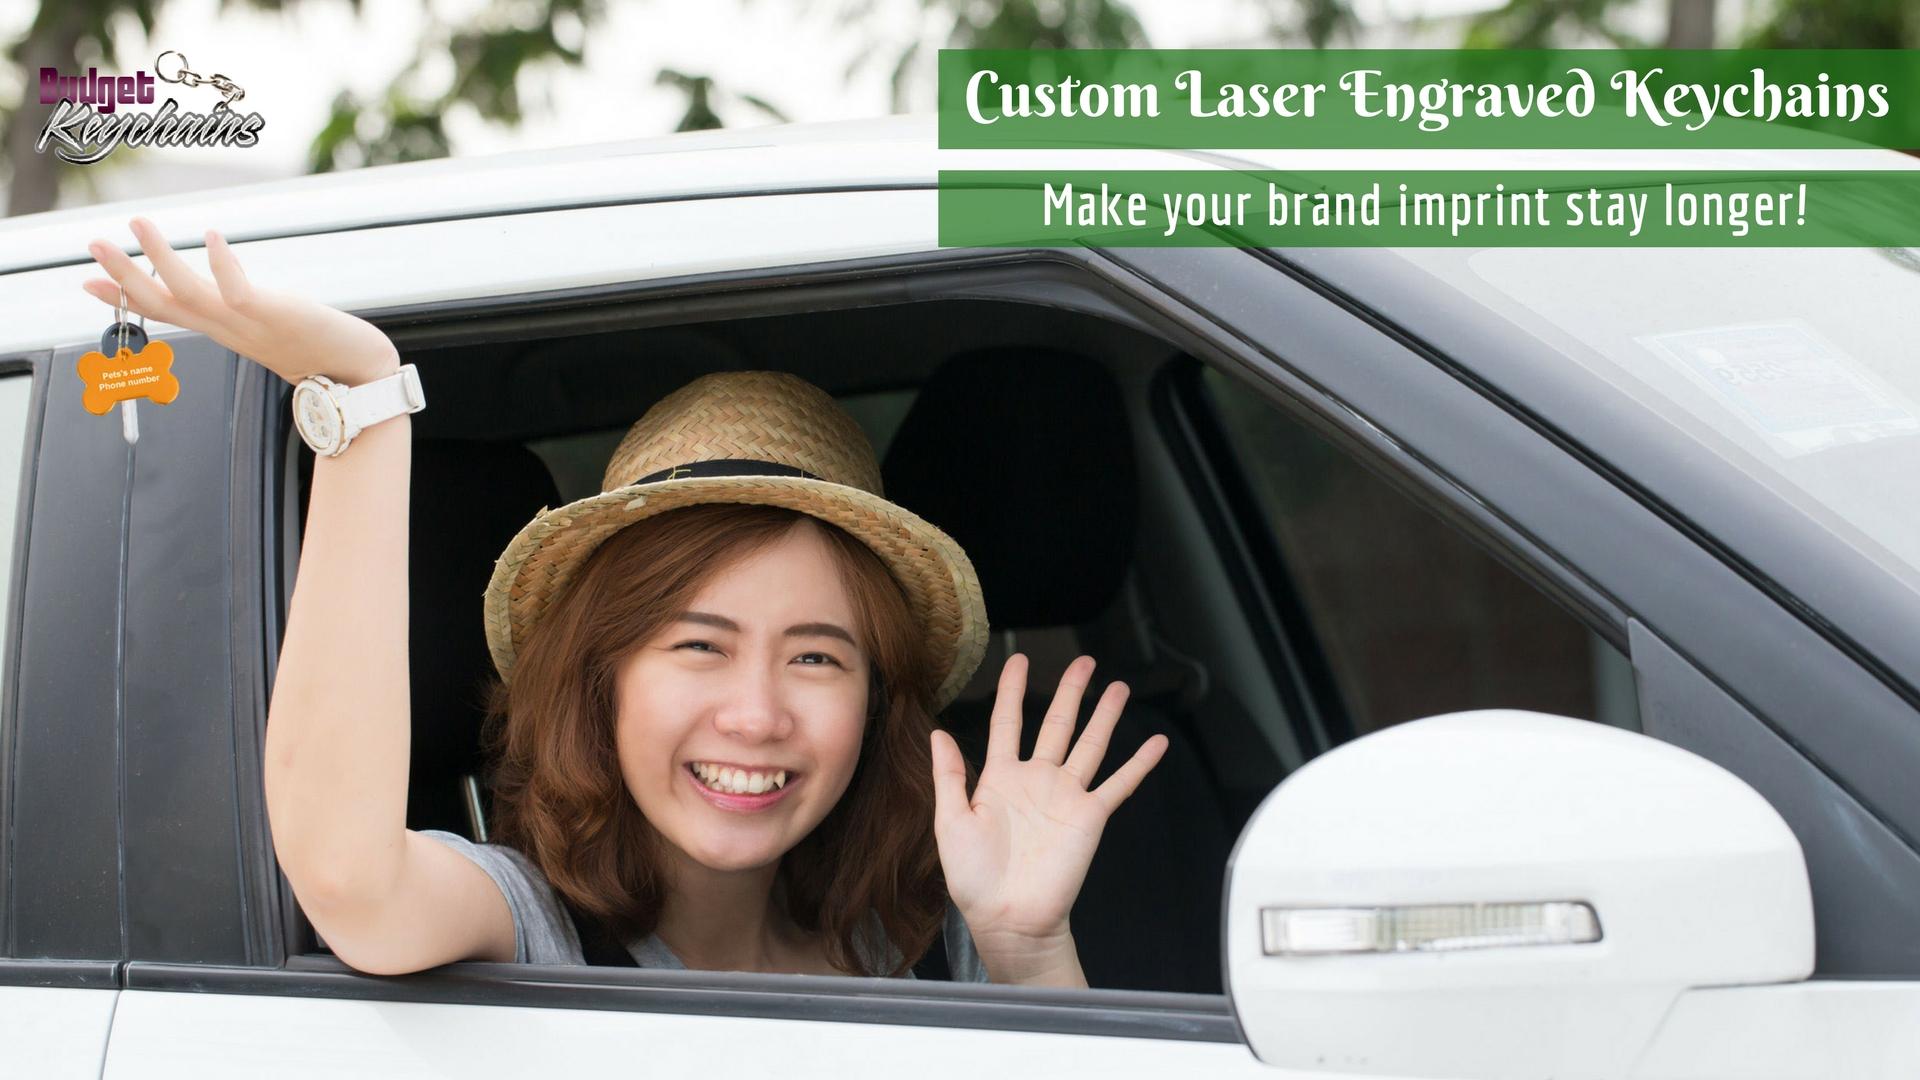 custom-laserEngravedKeychains-imprint-branding